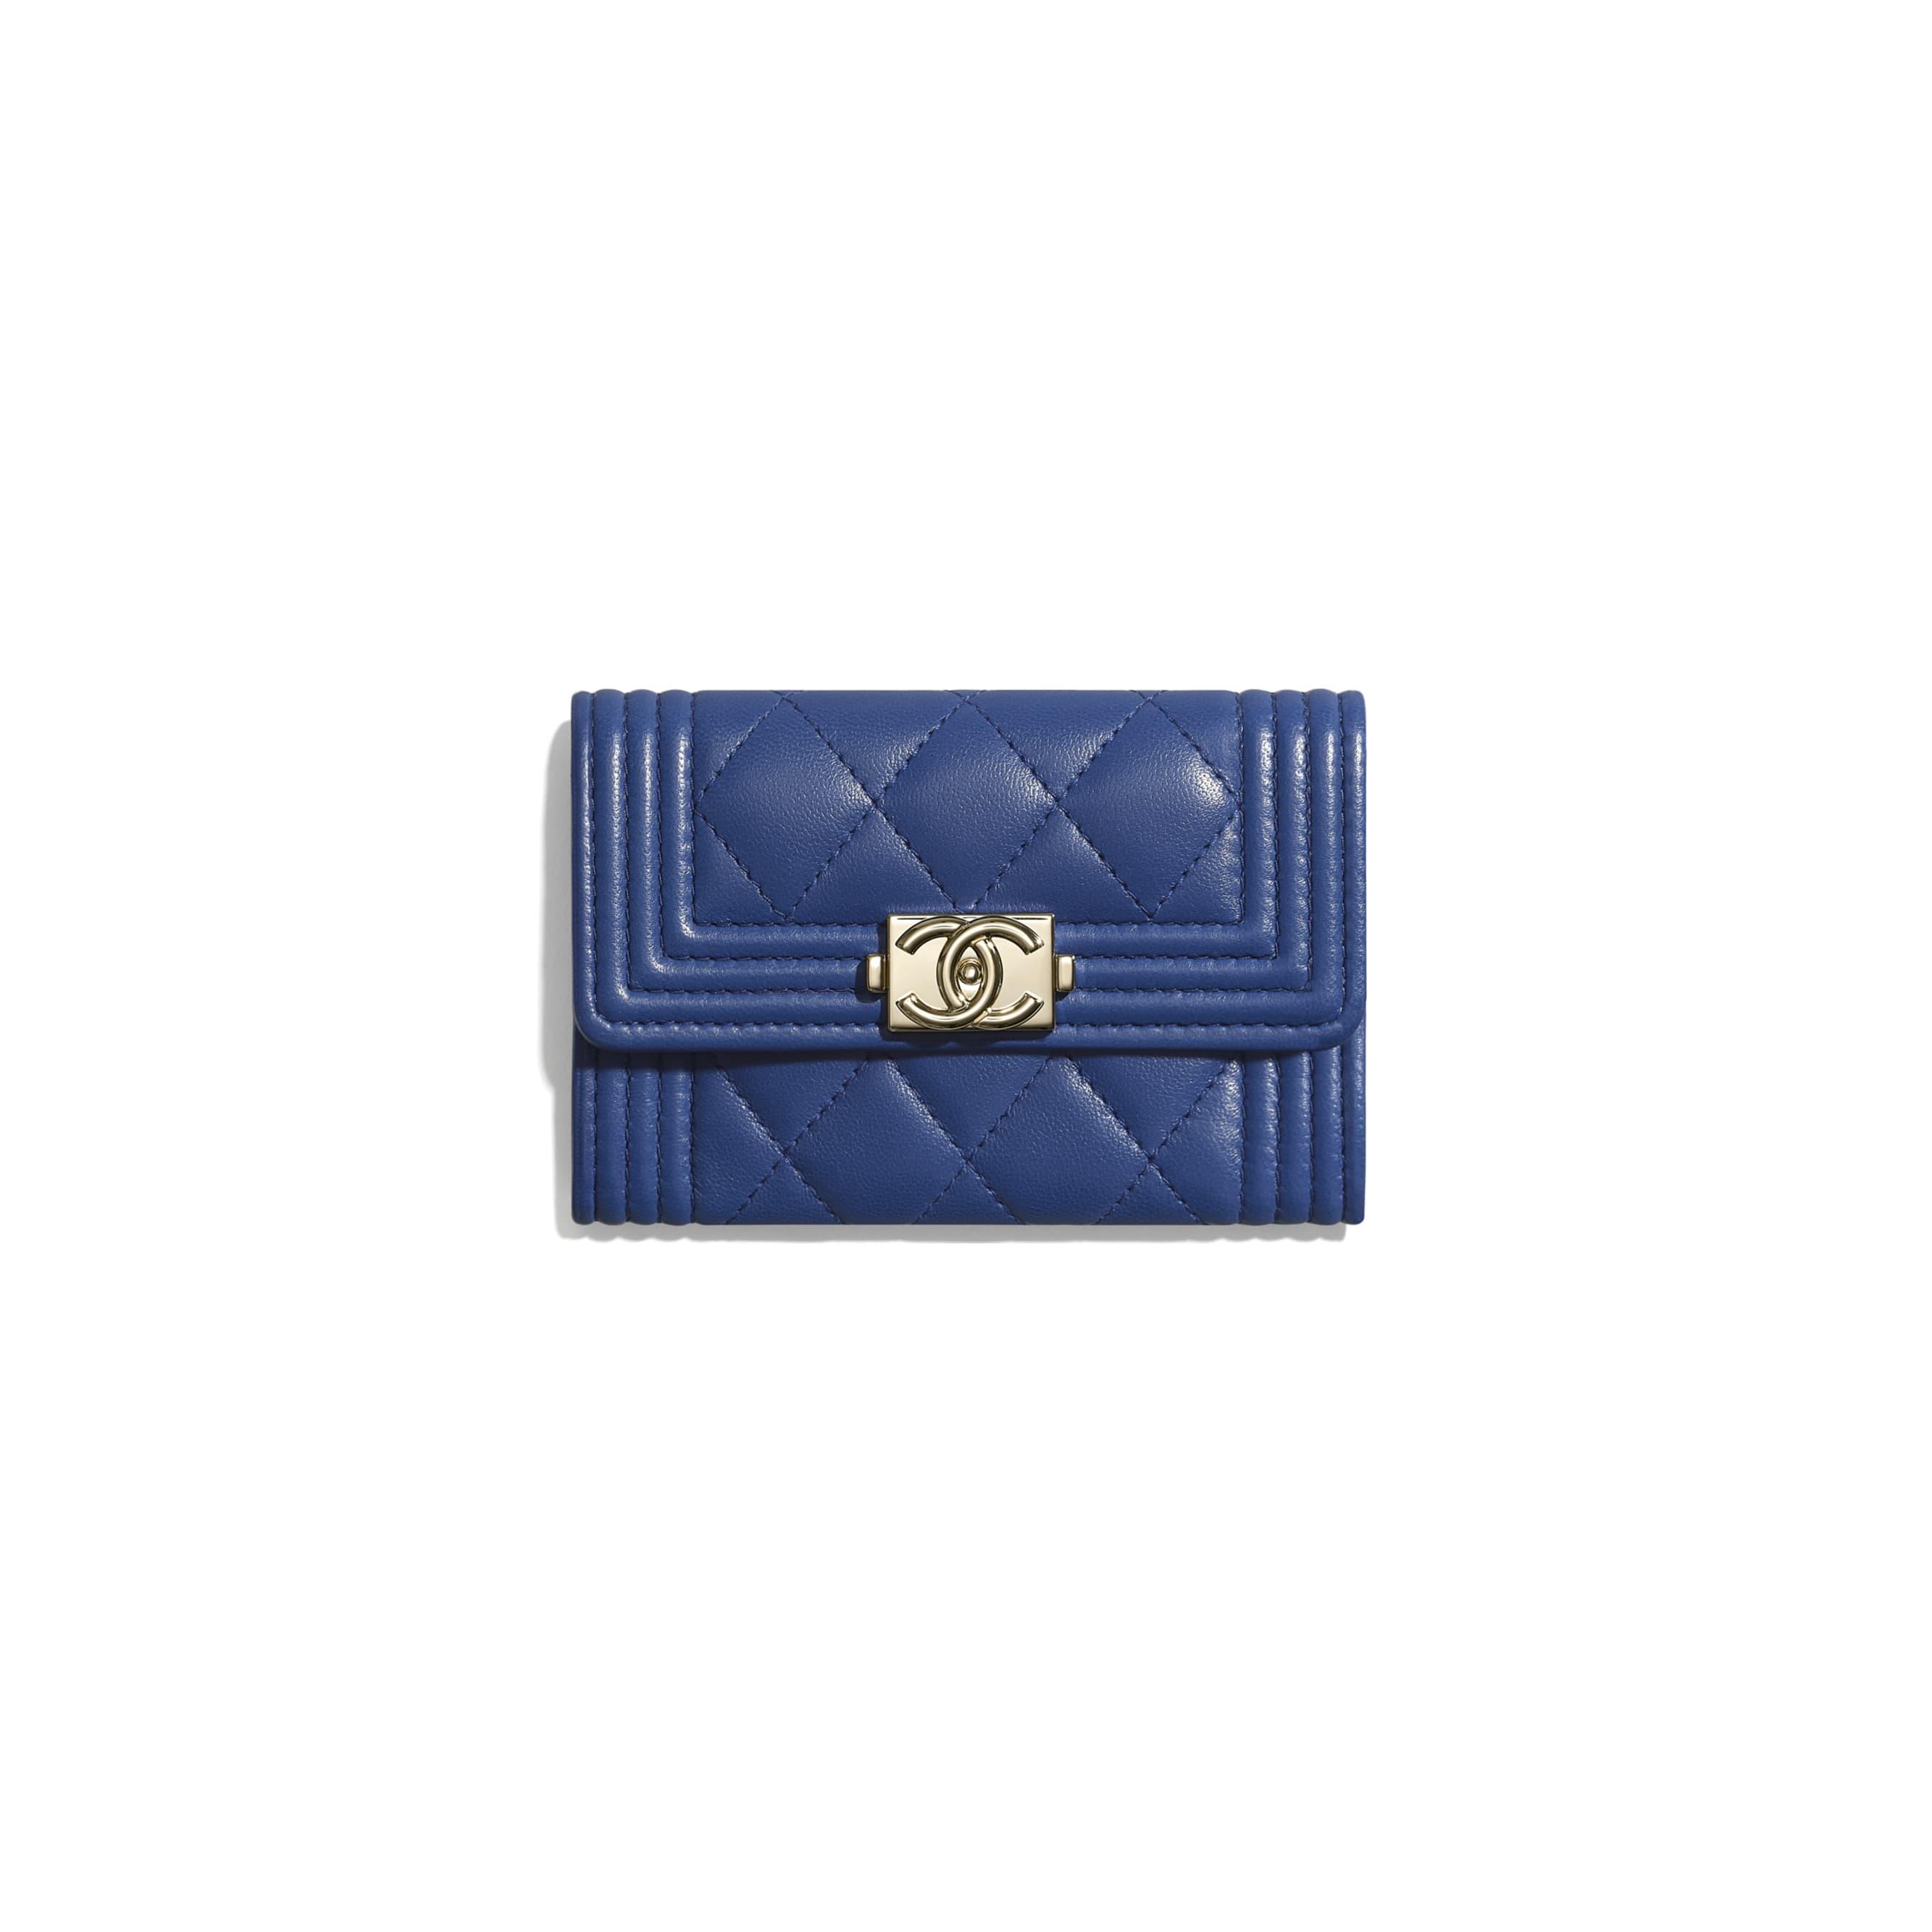 BOY CHANEL Flap Card Holder - Dark Blue - Lambskin & Gold-Tone Metal - CHANEL - Default view - see standard sized version